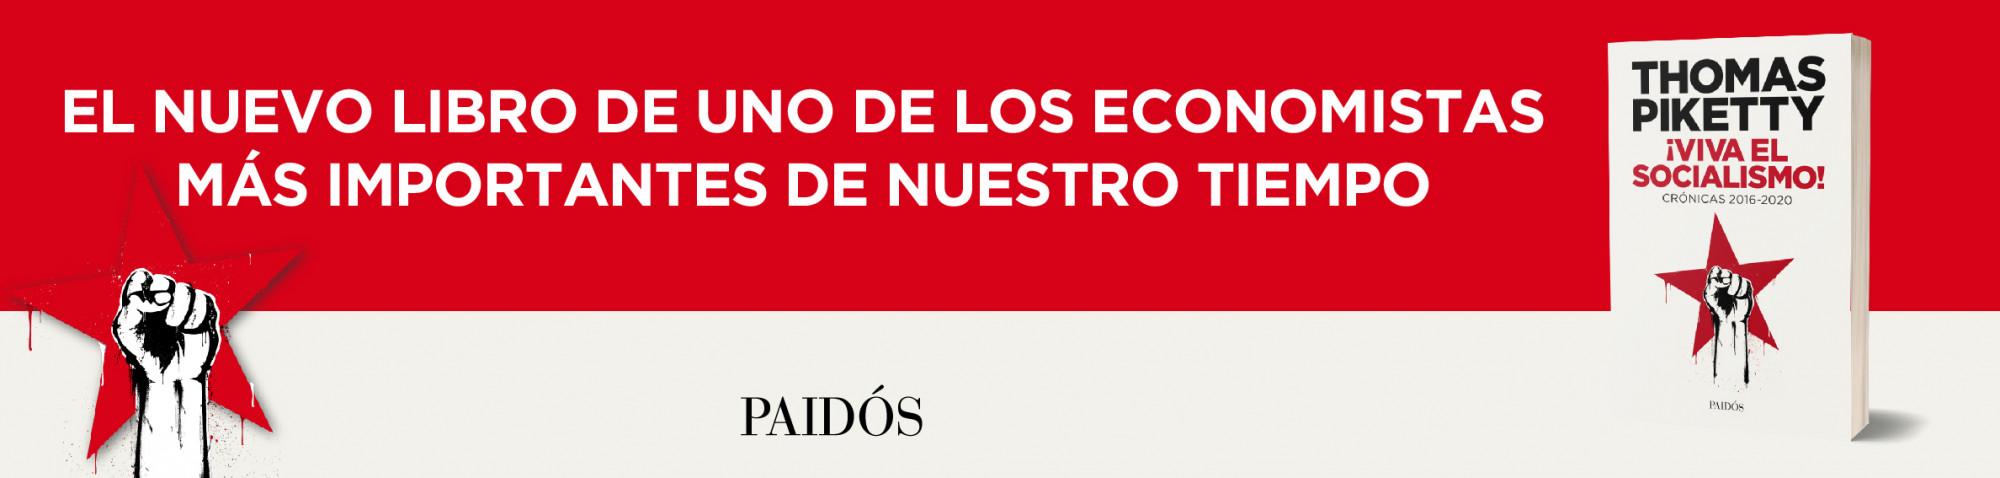 1845_1_Banner_PDL_Viva_el_socialismo_1140x272.jpg